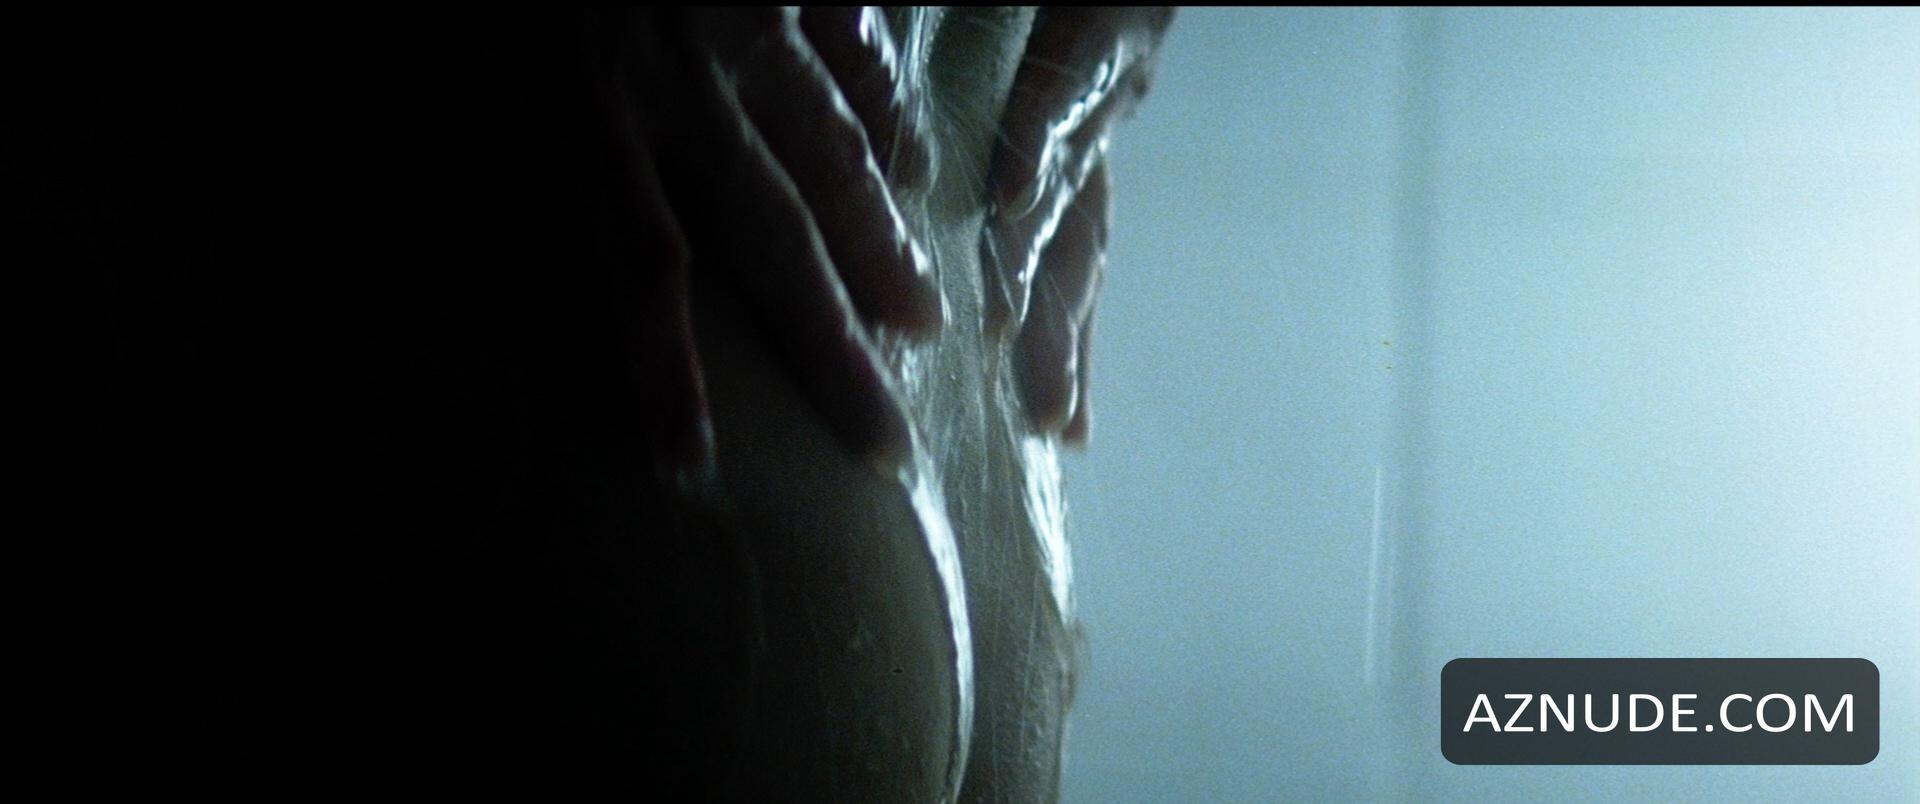 from Ryland the hunger sex scene